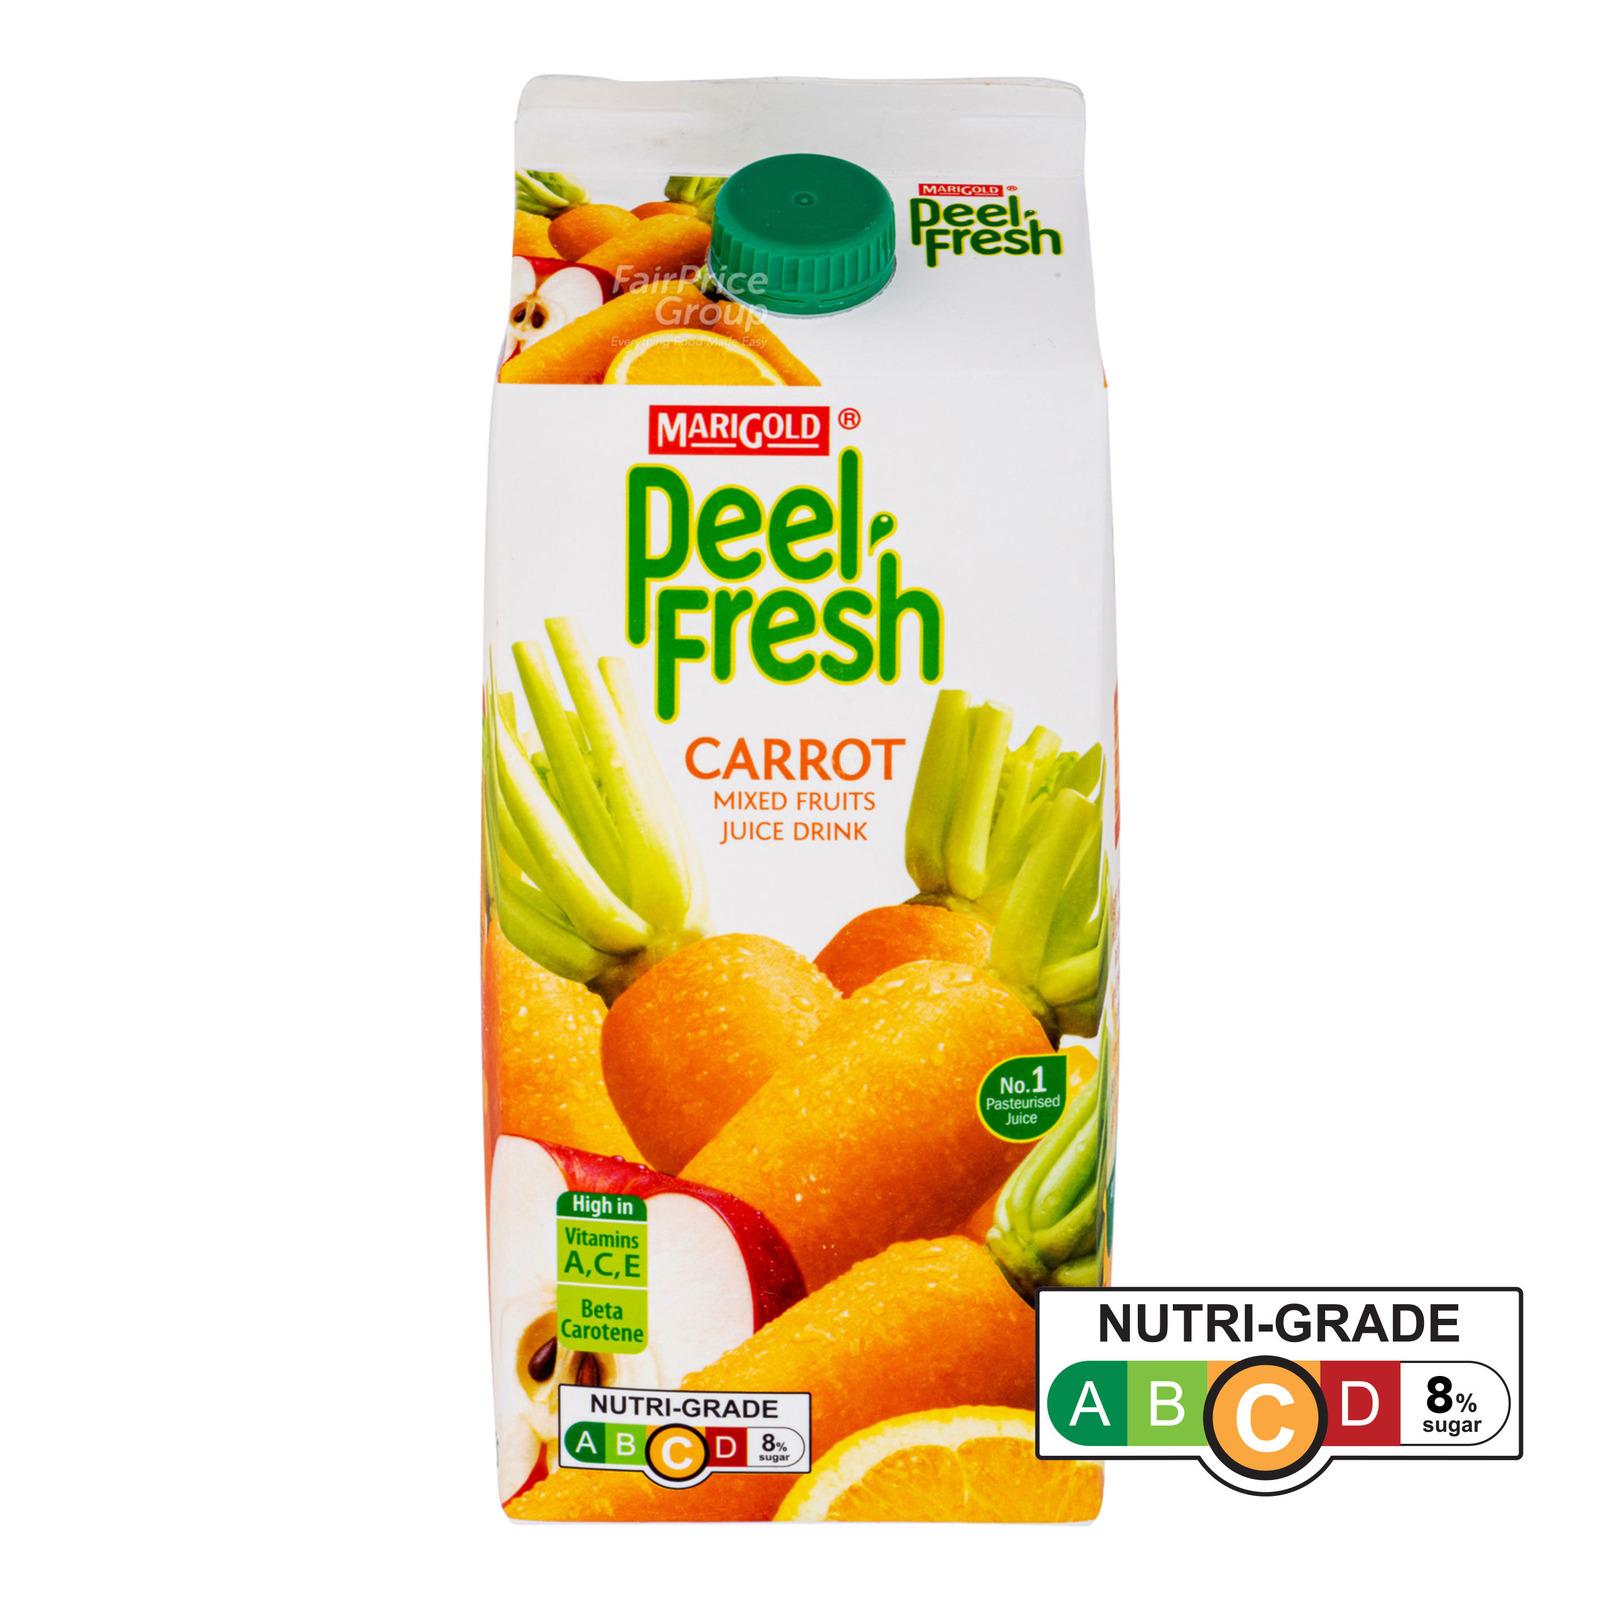 Marigold Peel Fresh Juice Drink - Carrot